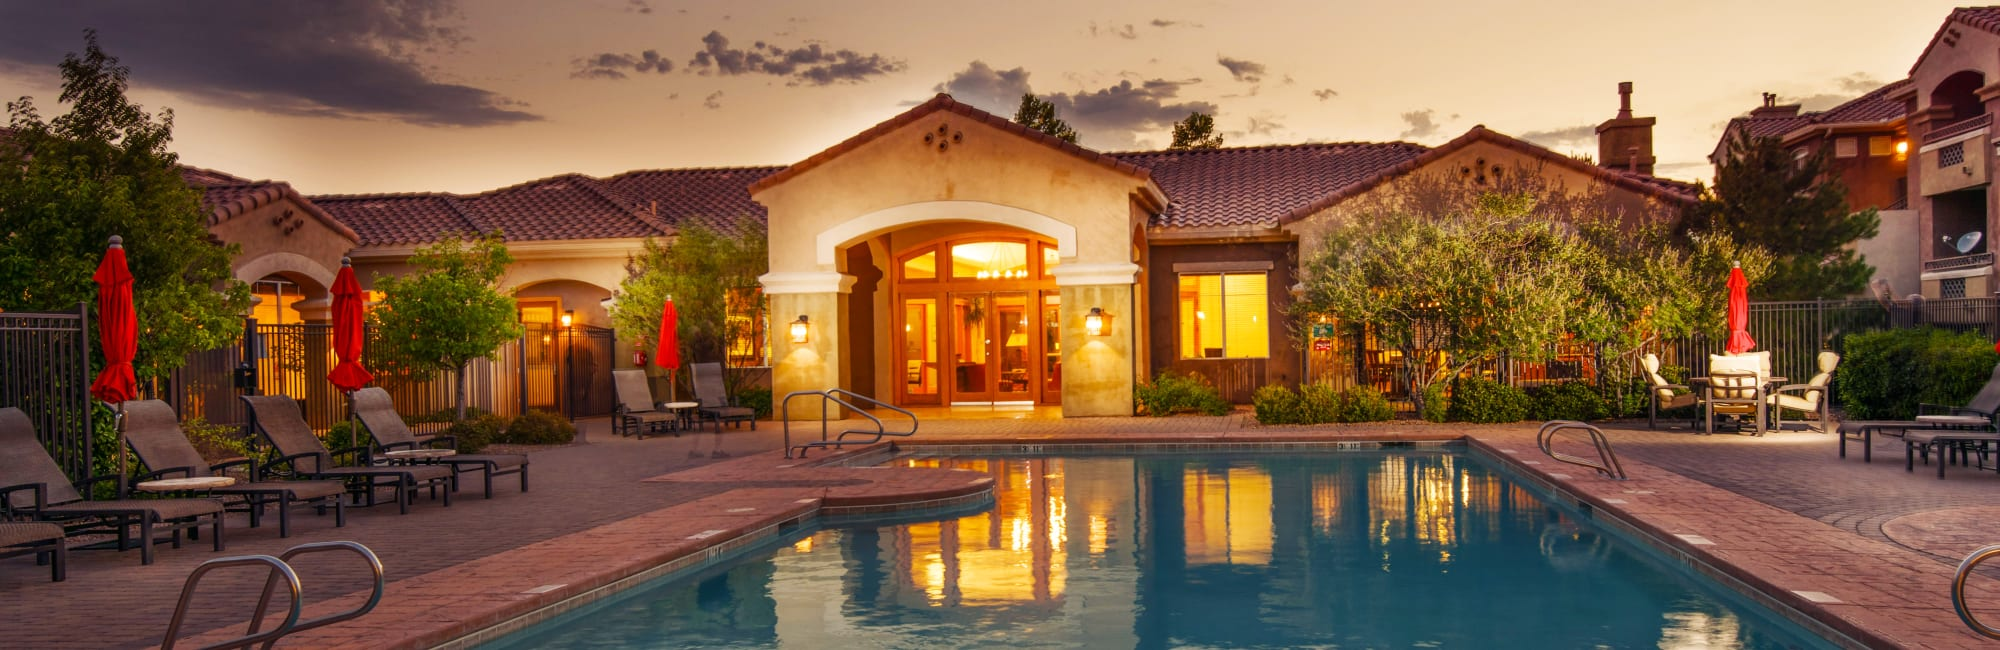 Albuquerque, New Mexico, apartments at Broadstone Towne Center